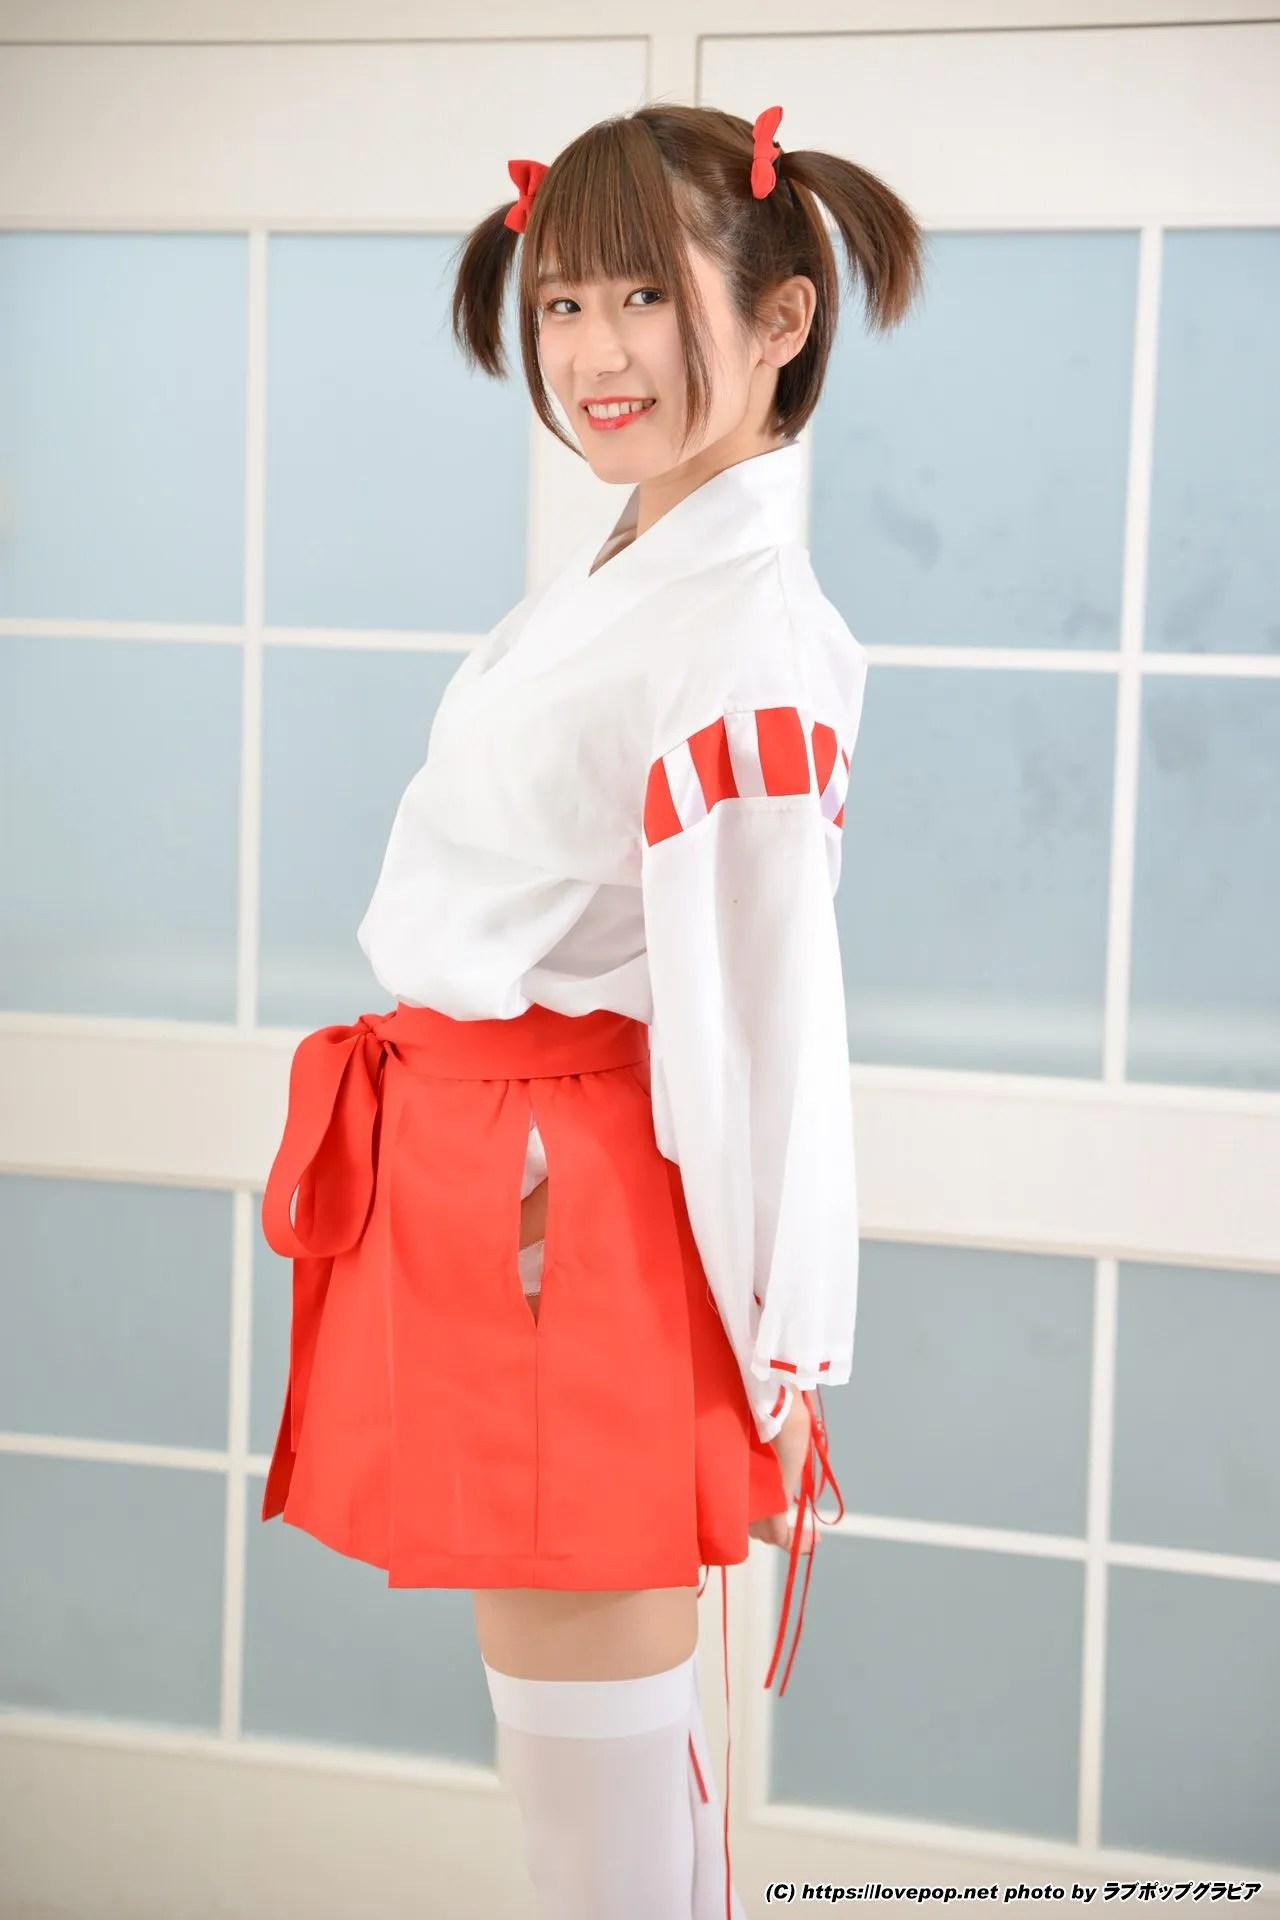 [LOVEPOP] Usako Kurusu 来栖うさこ Photoset 01 写真集[68P]插图(9)